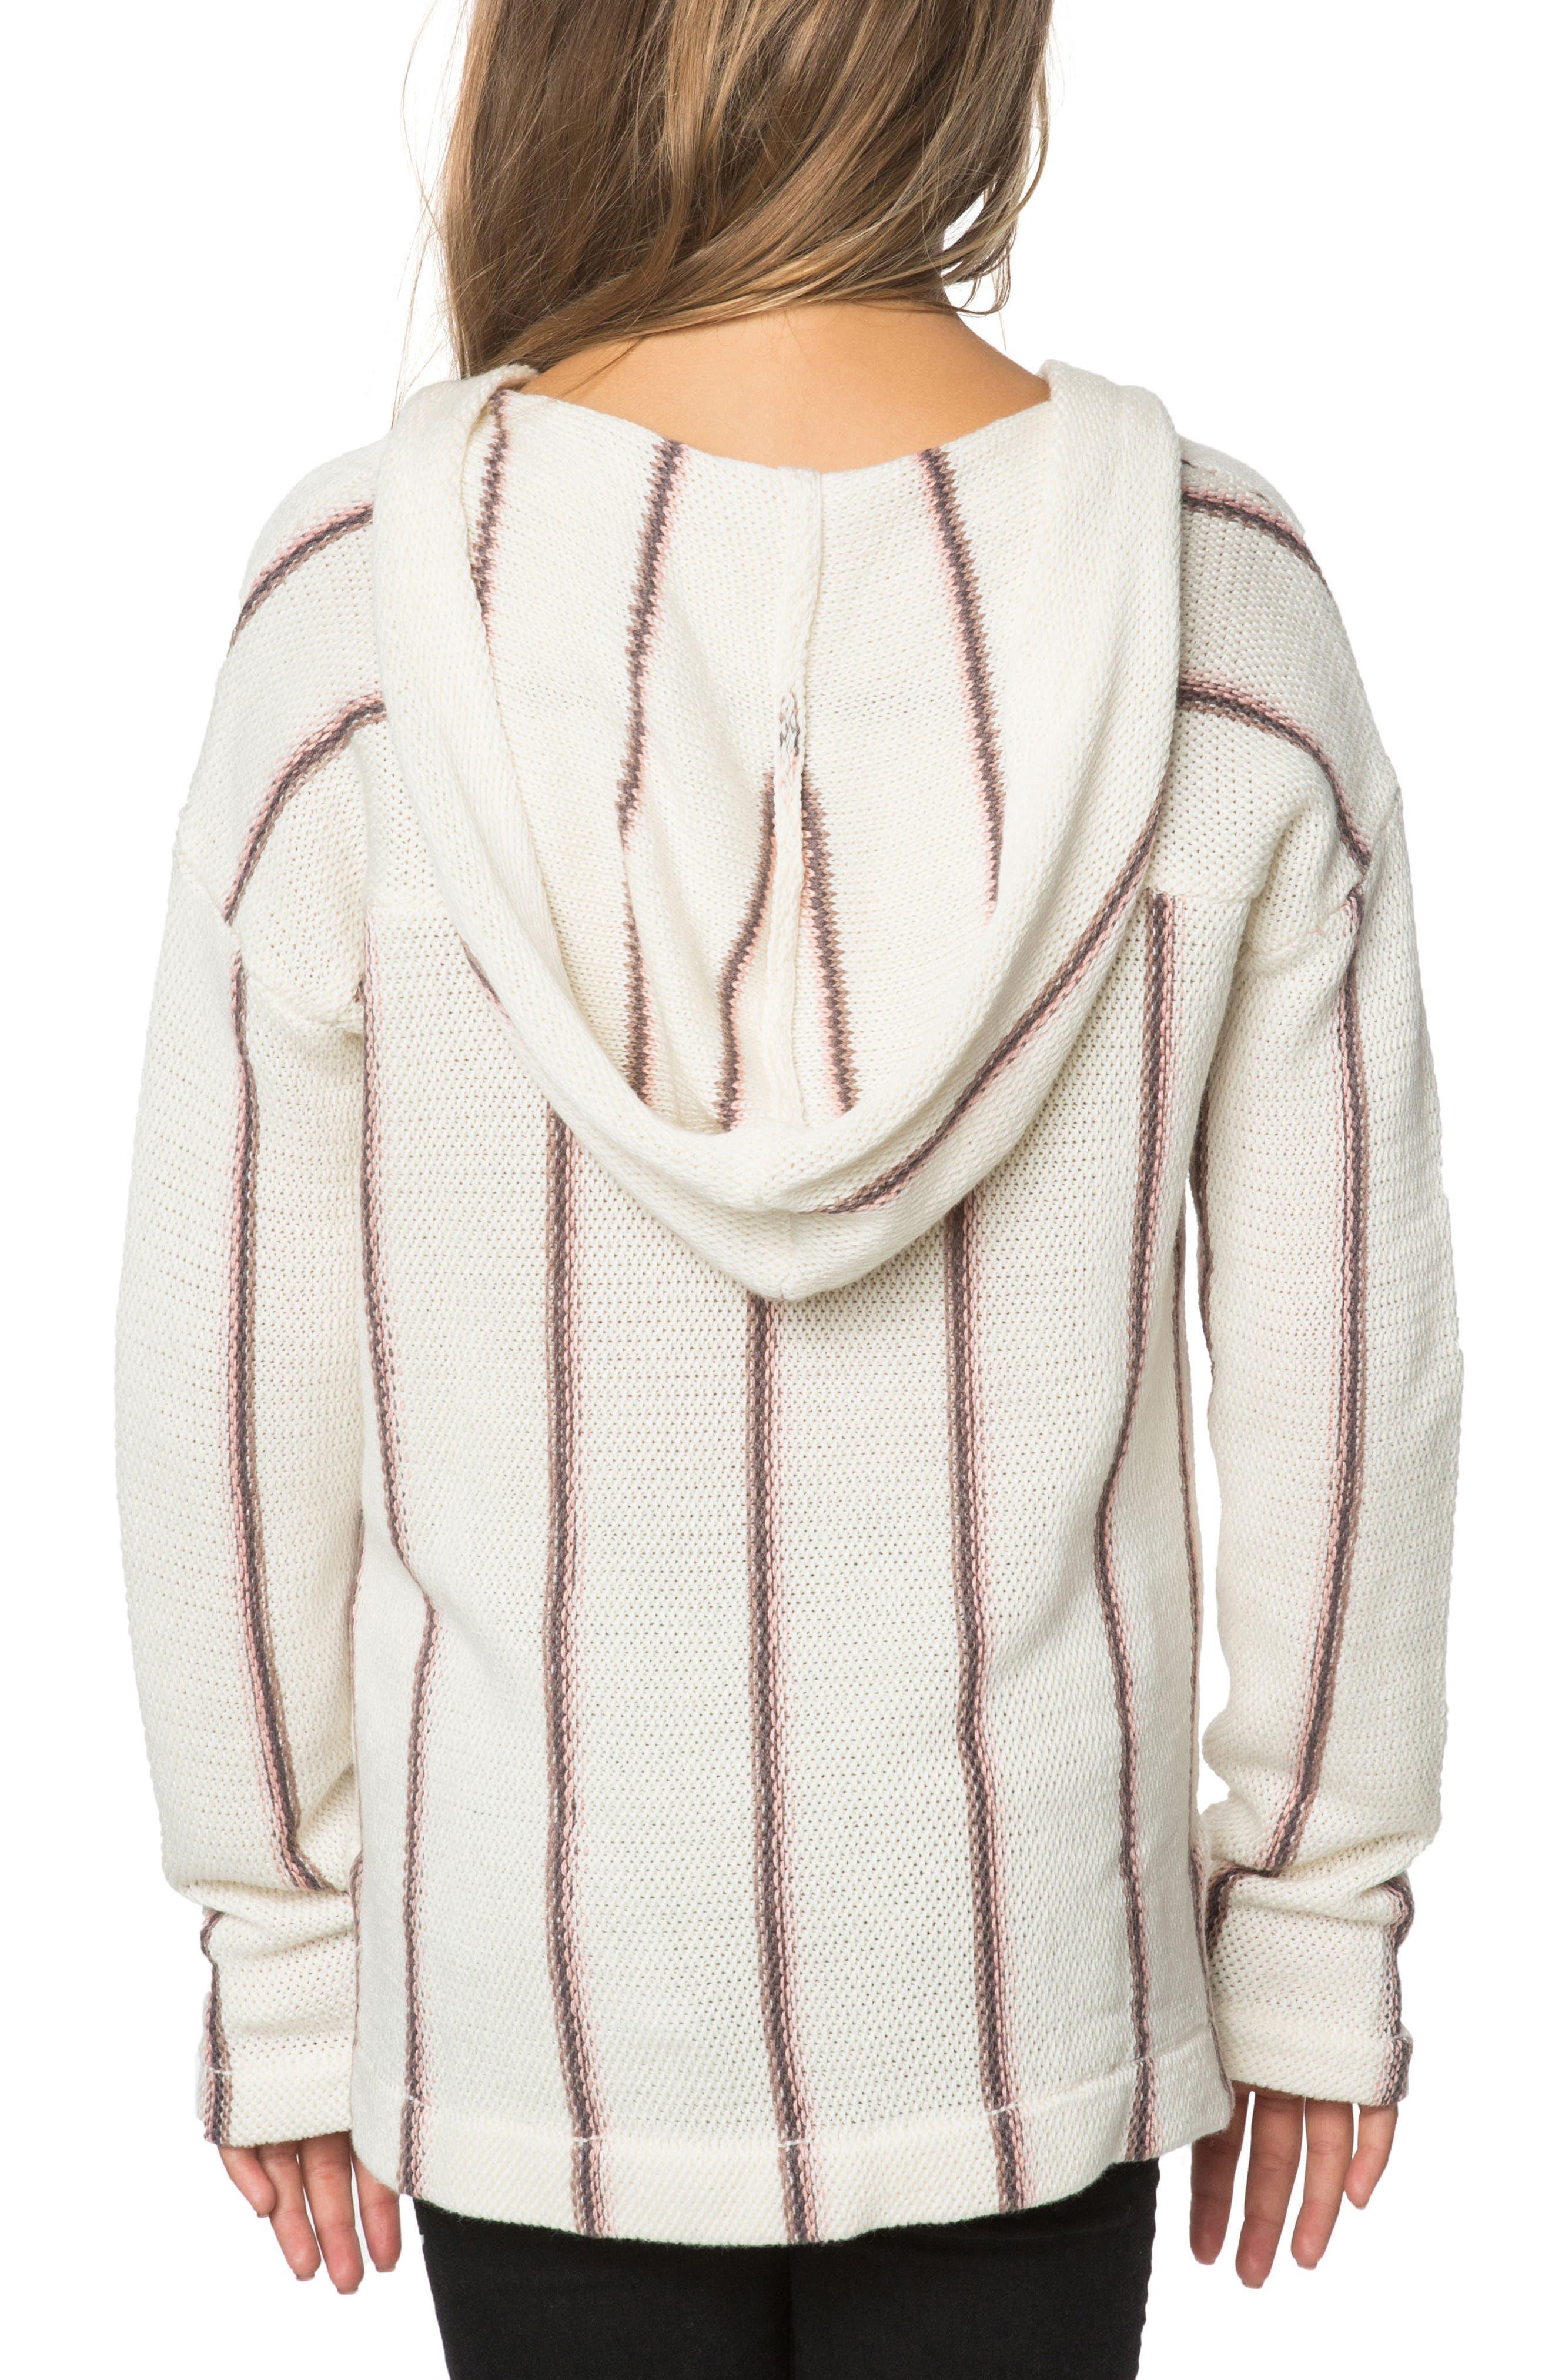 Ashlynn Hooded Sweater,                             Alternate thumbnail 2, color,                             900